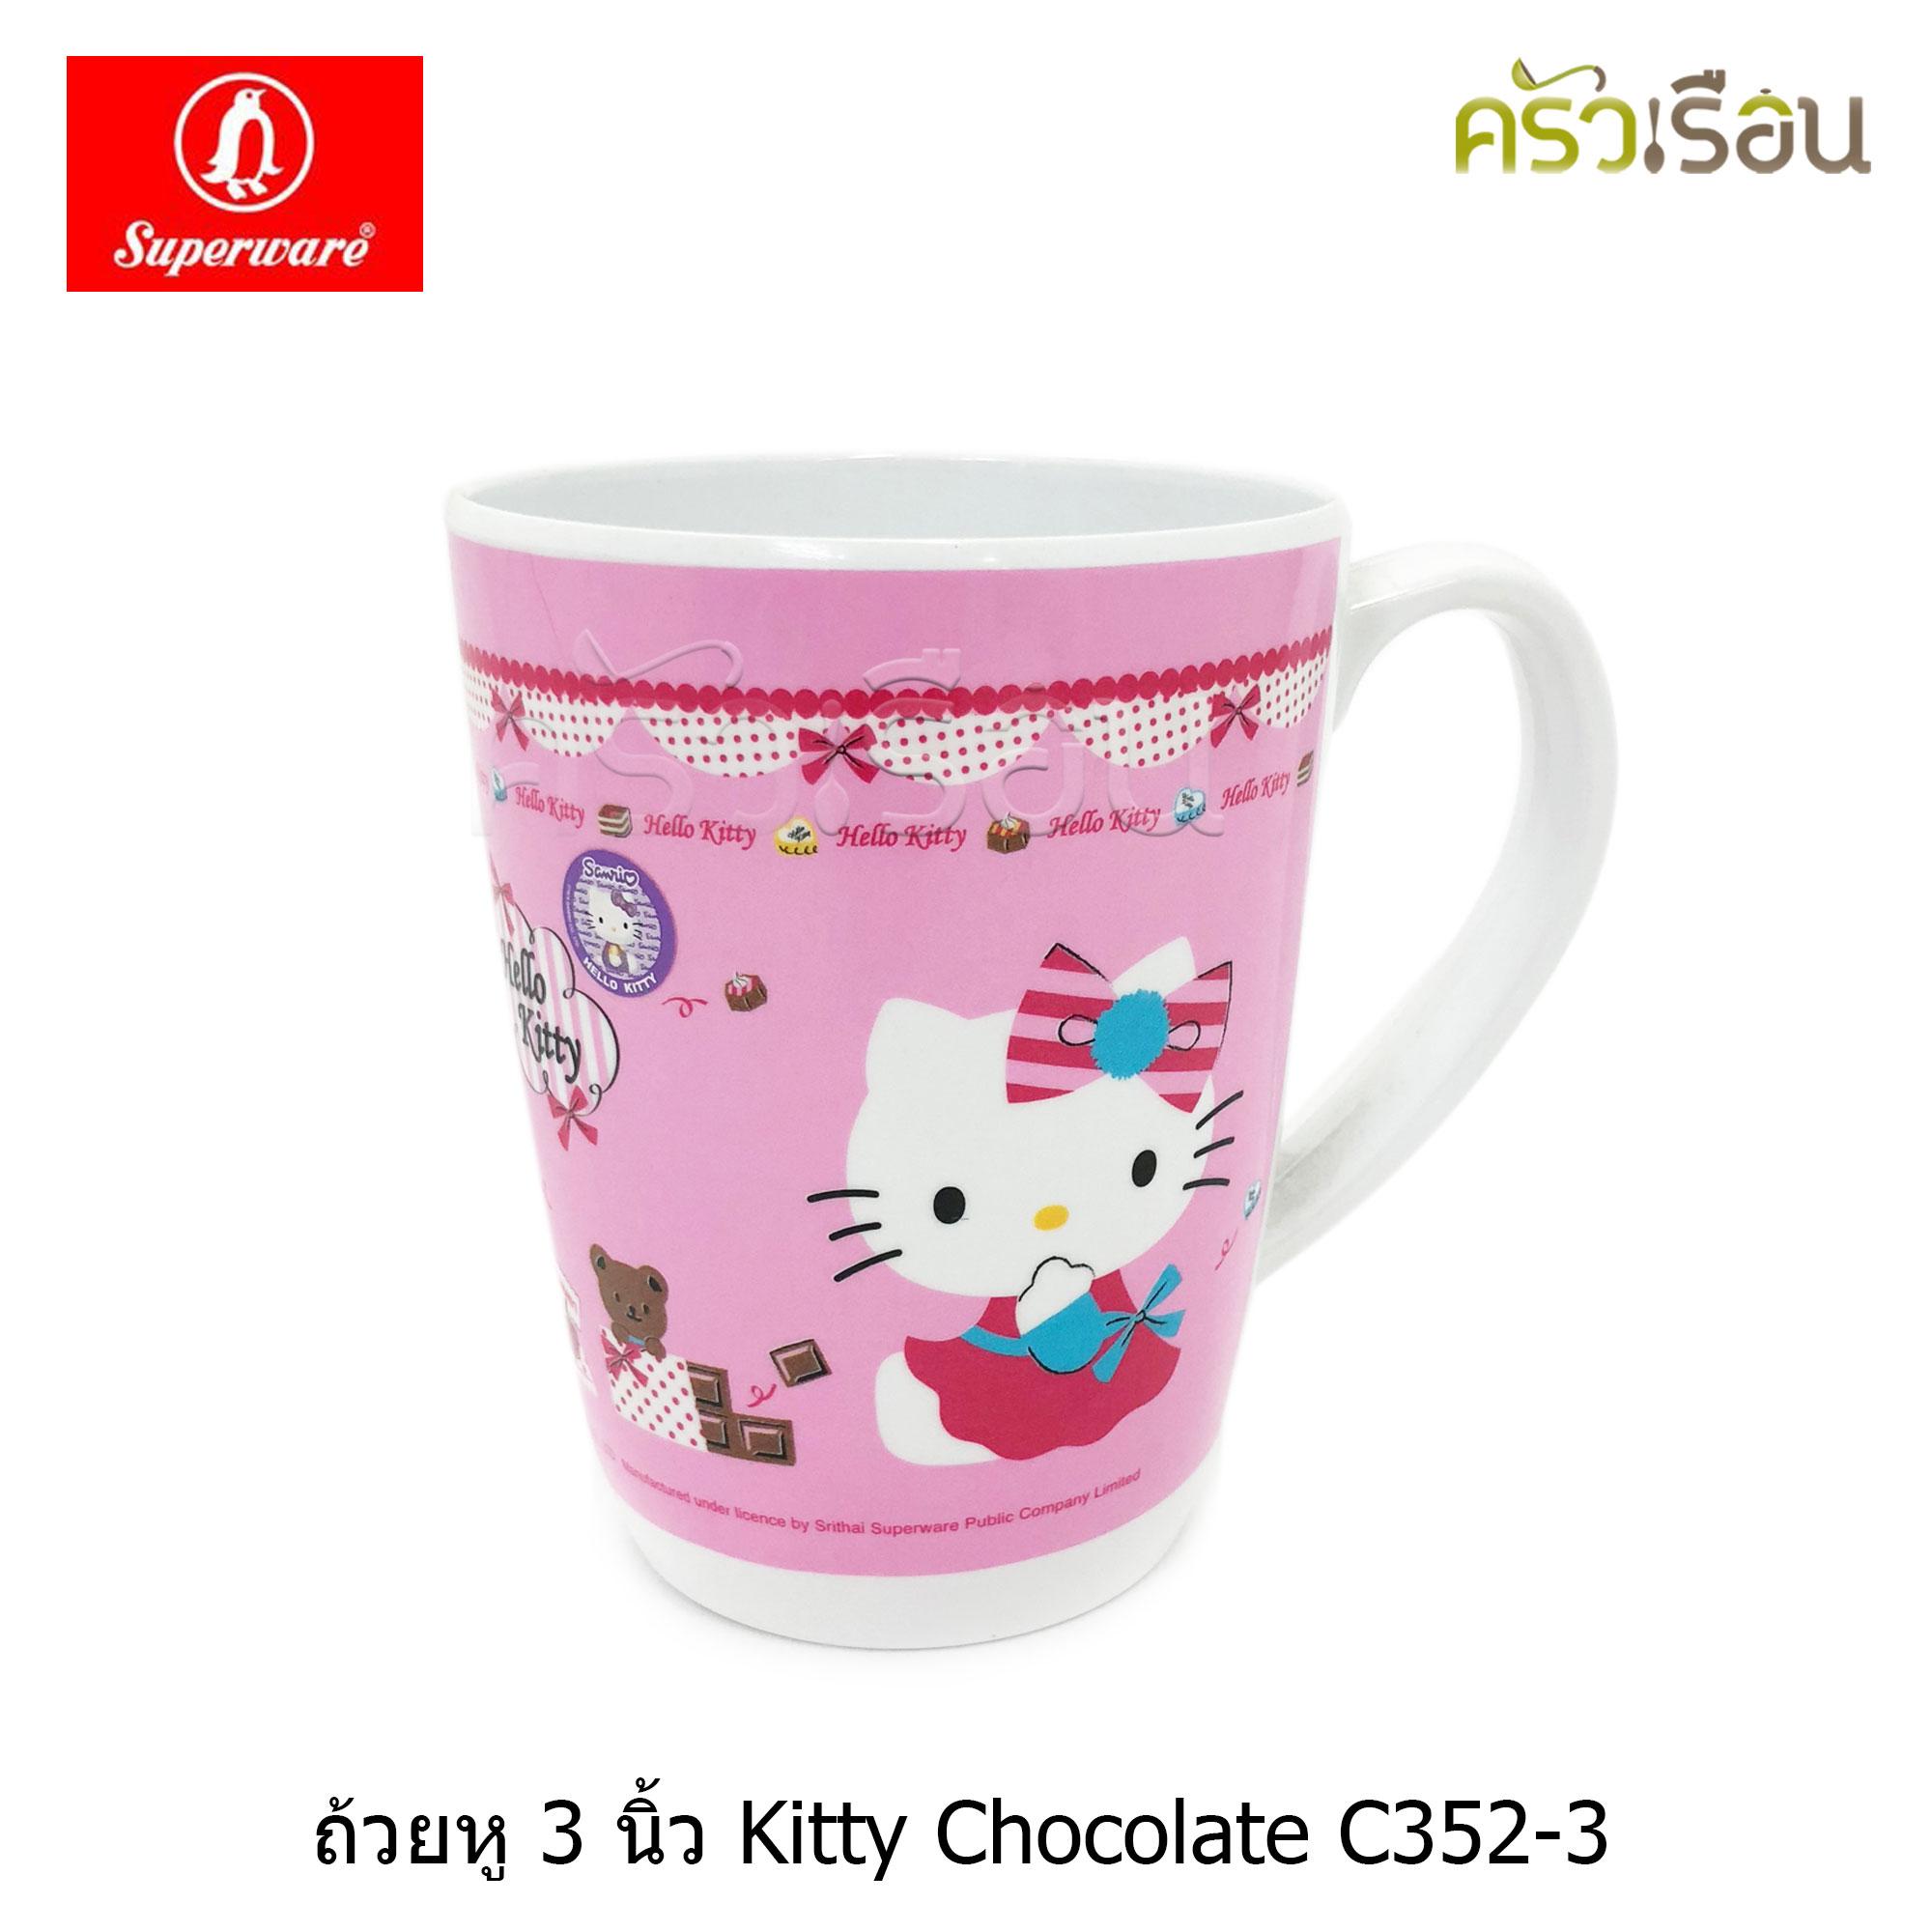 Superware ถ้วยหู Kitty Chocolate 3 นิ้วสูง C352-3